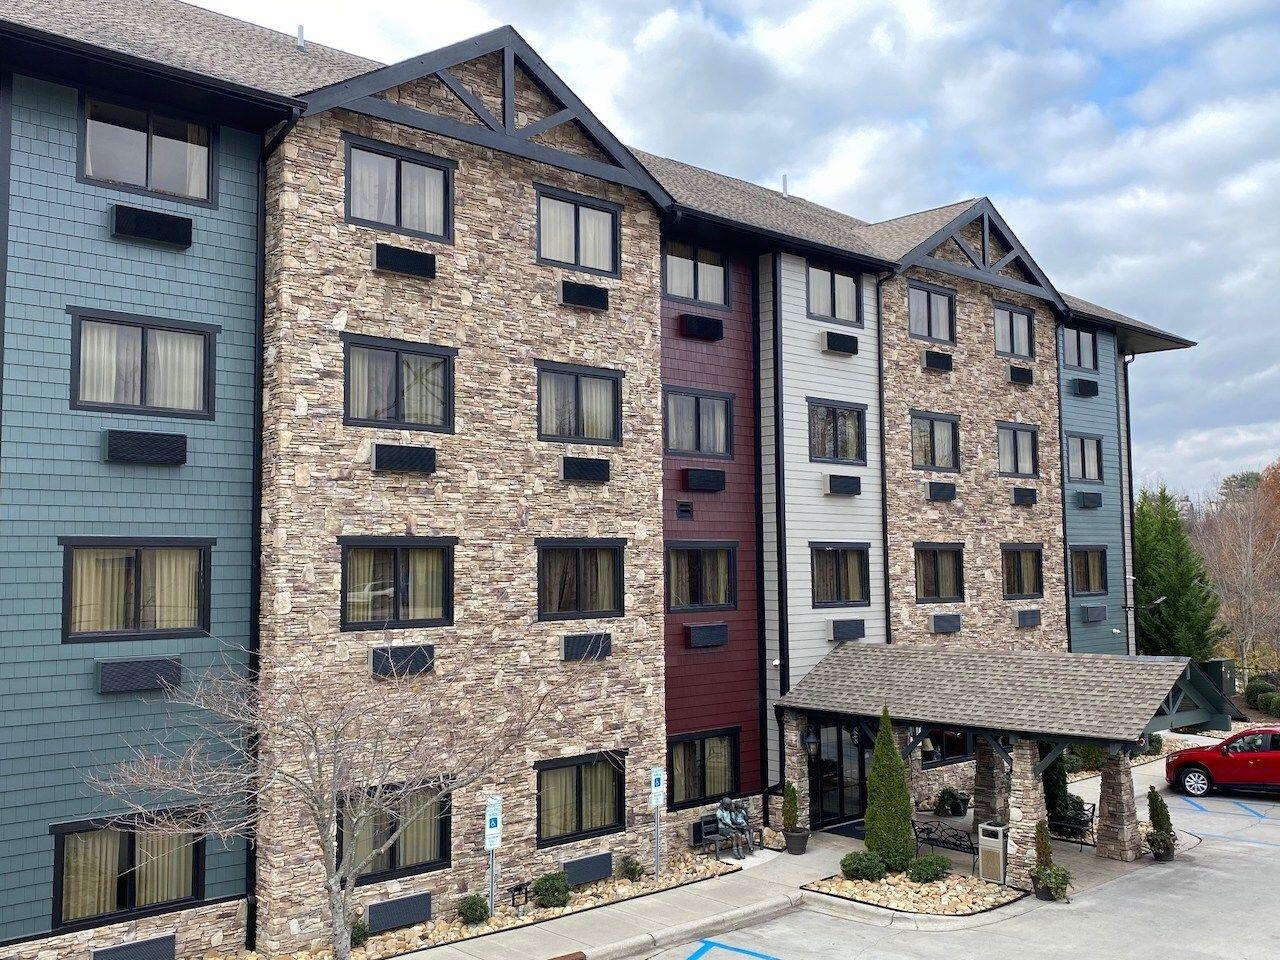 brookstone-lodge-downtown-asheville-hotels